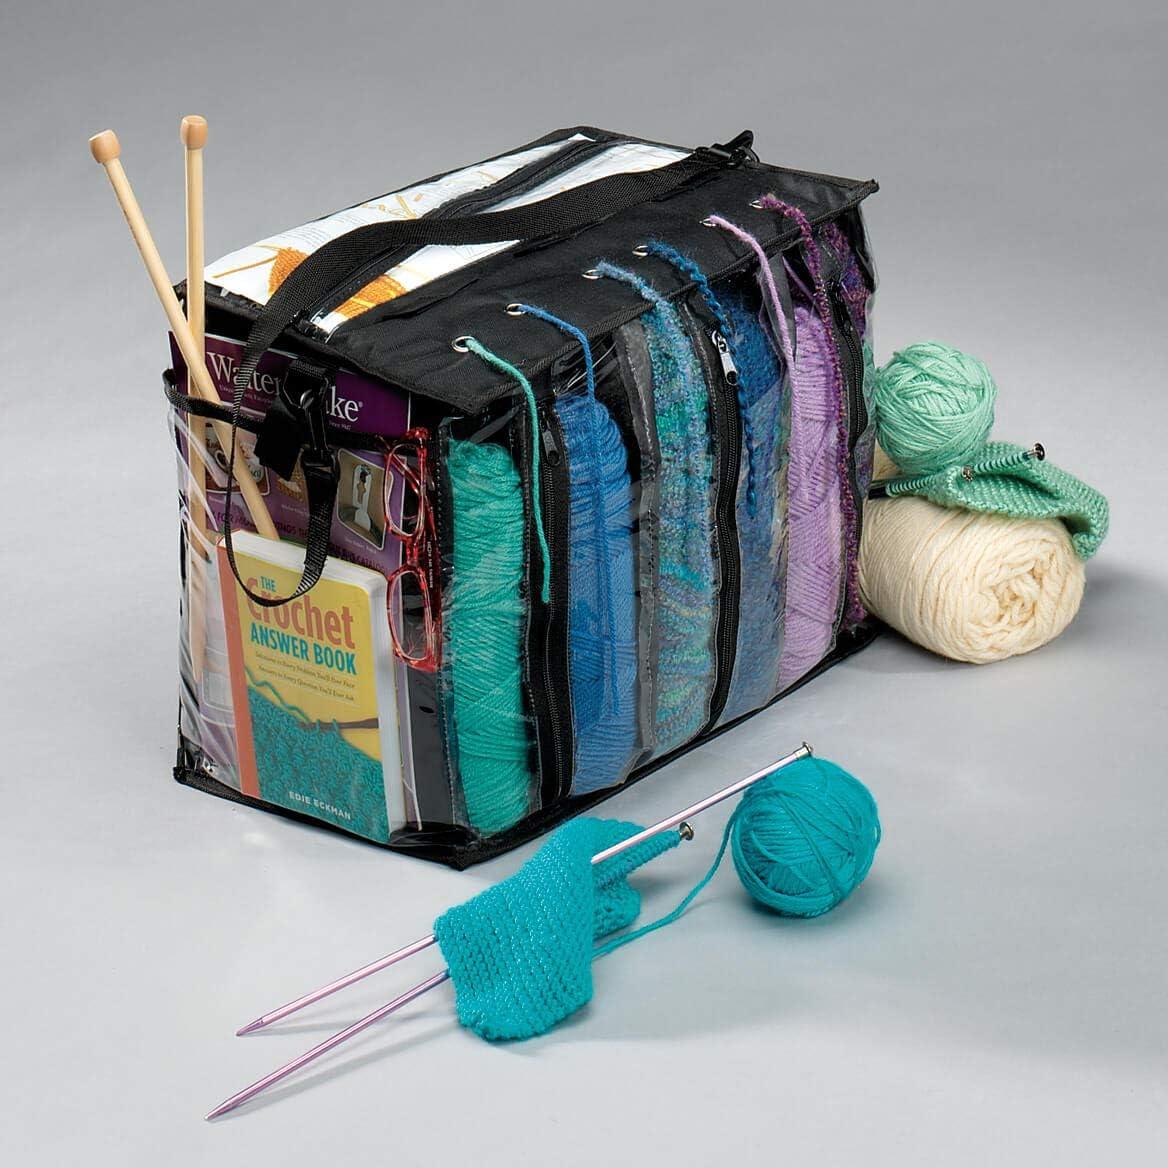 Miles Kimball Knitting Tote Bag- Yarn & Knitting Organizer Bag